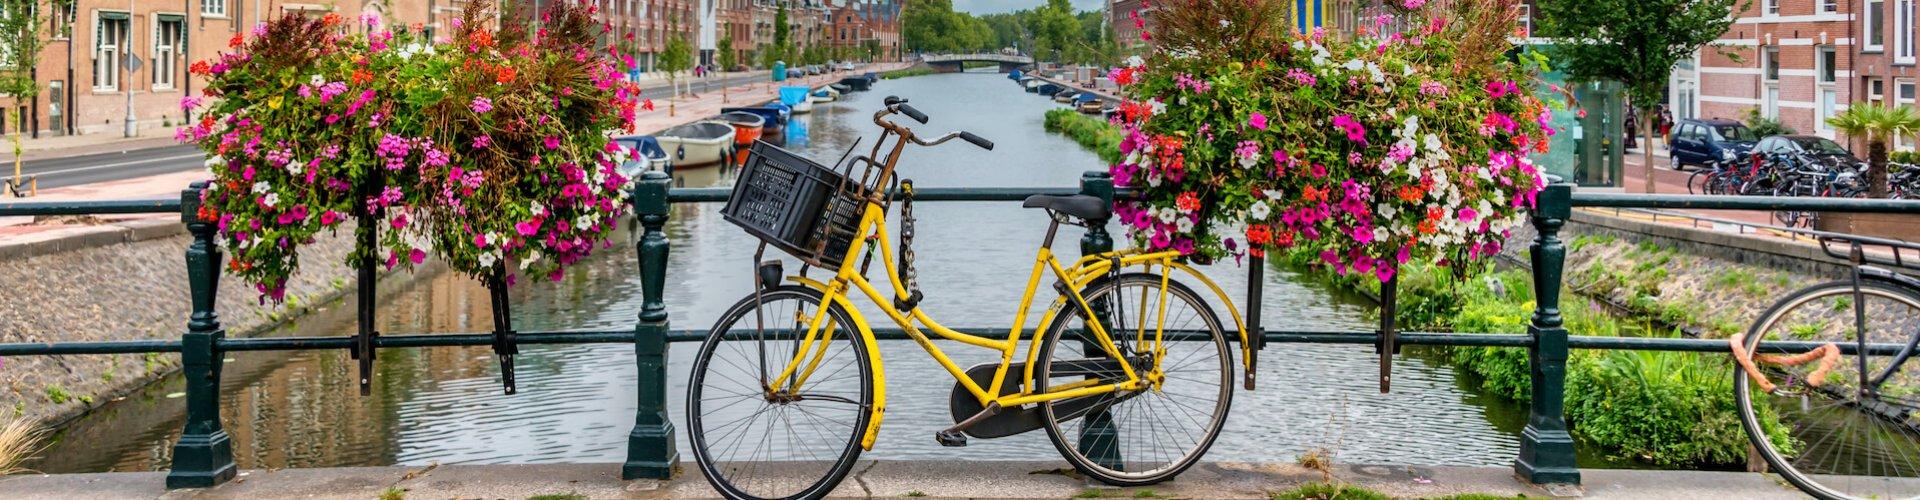 Ausflugsziel Amsterdam